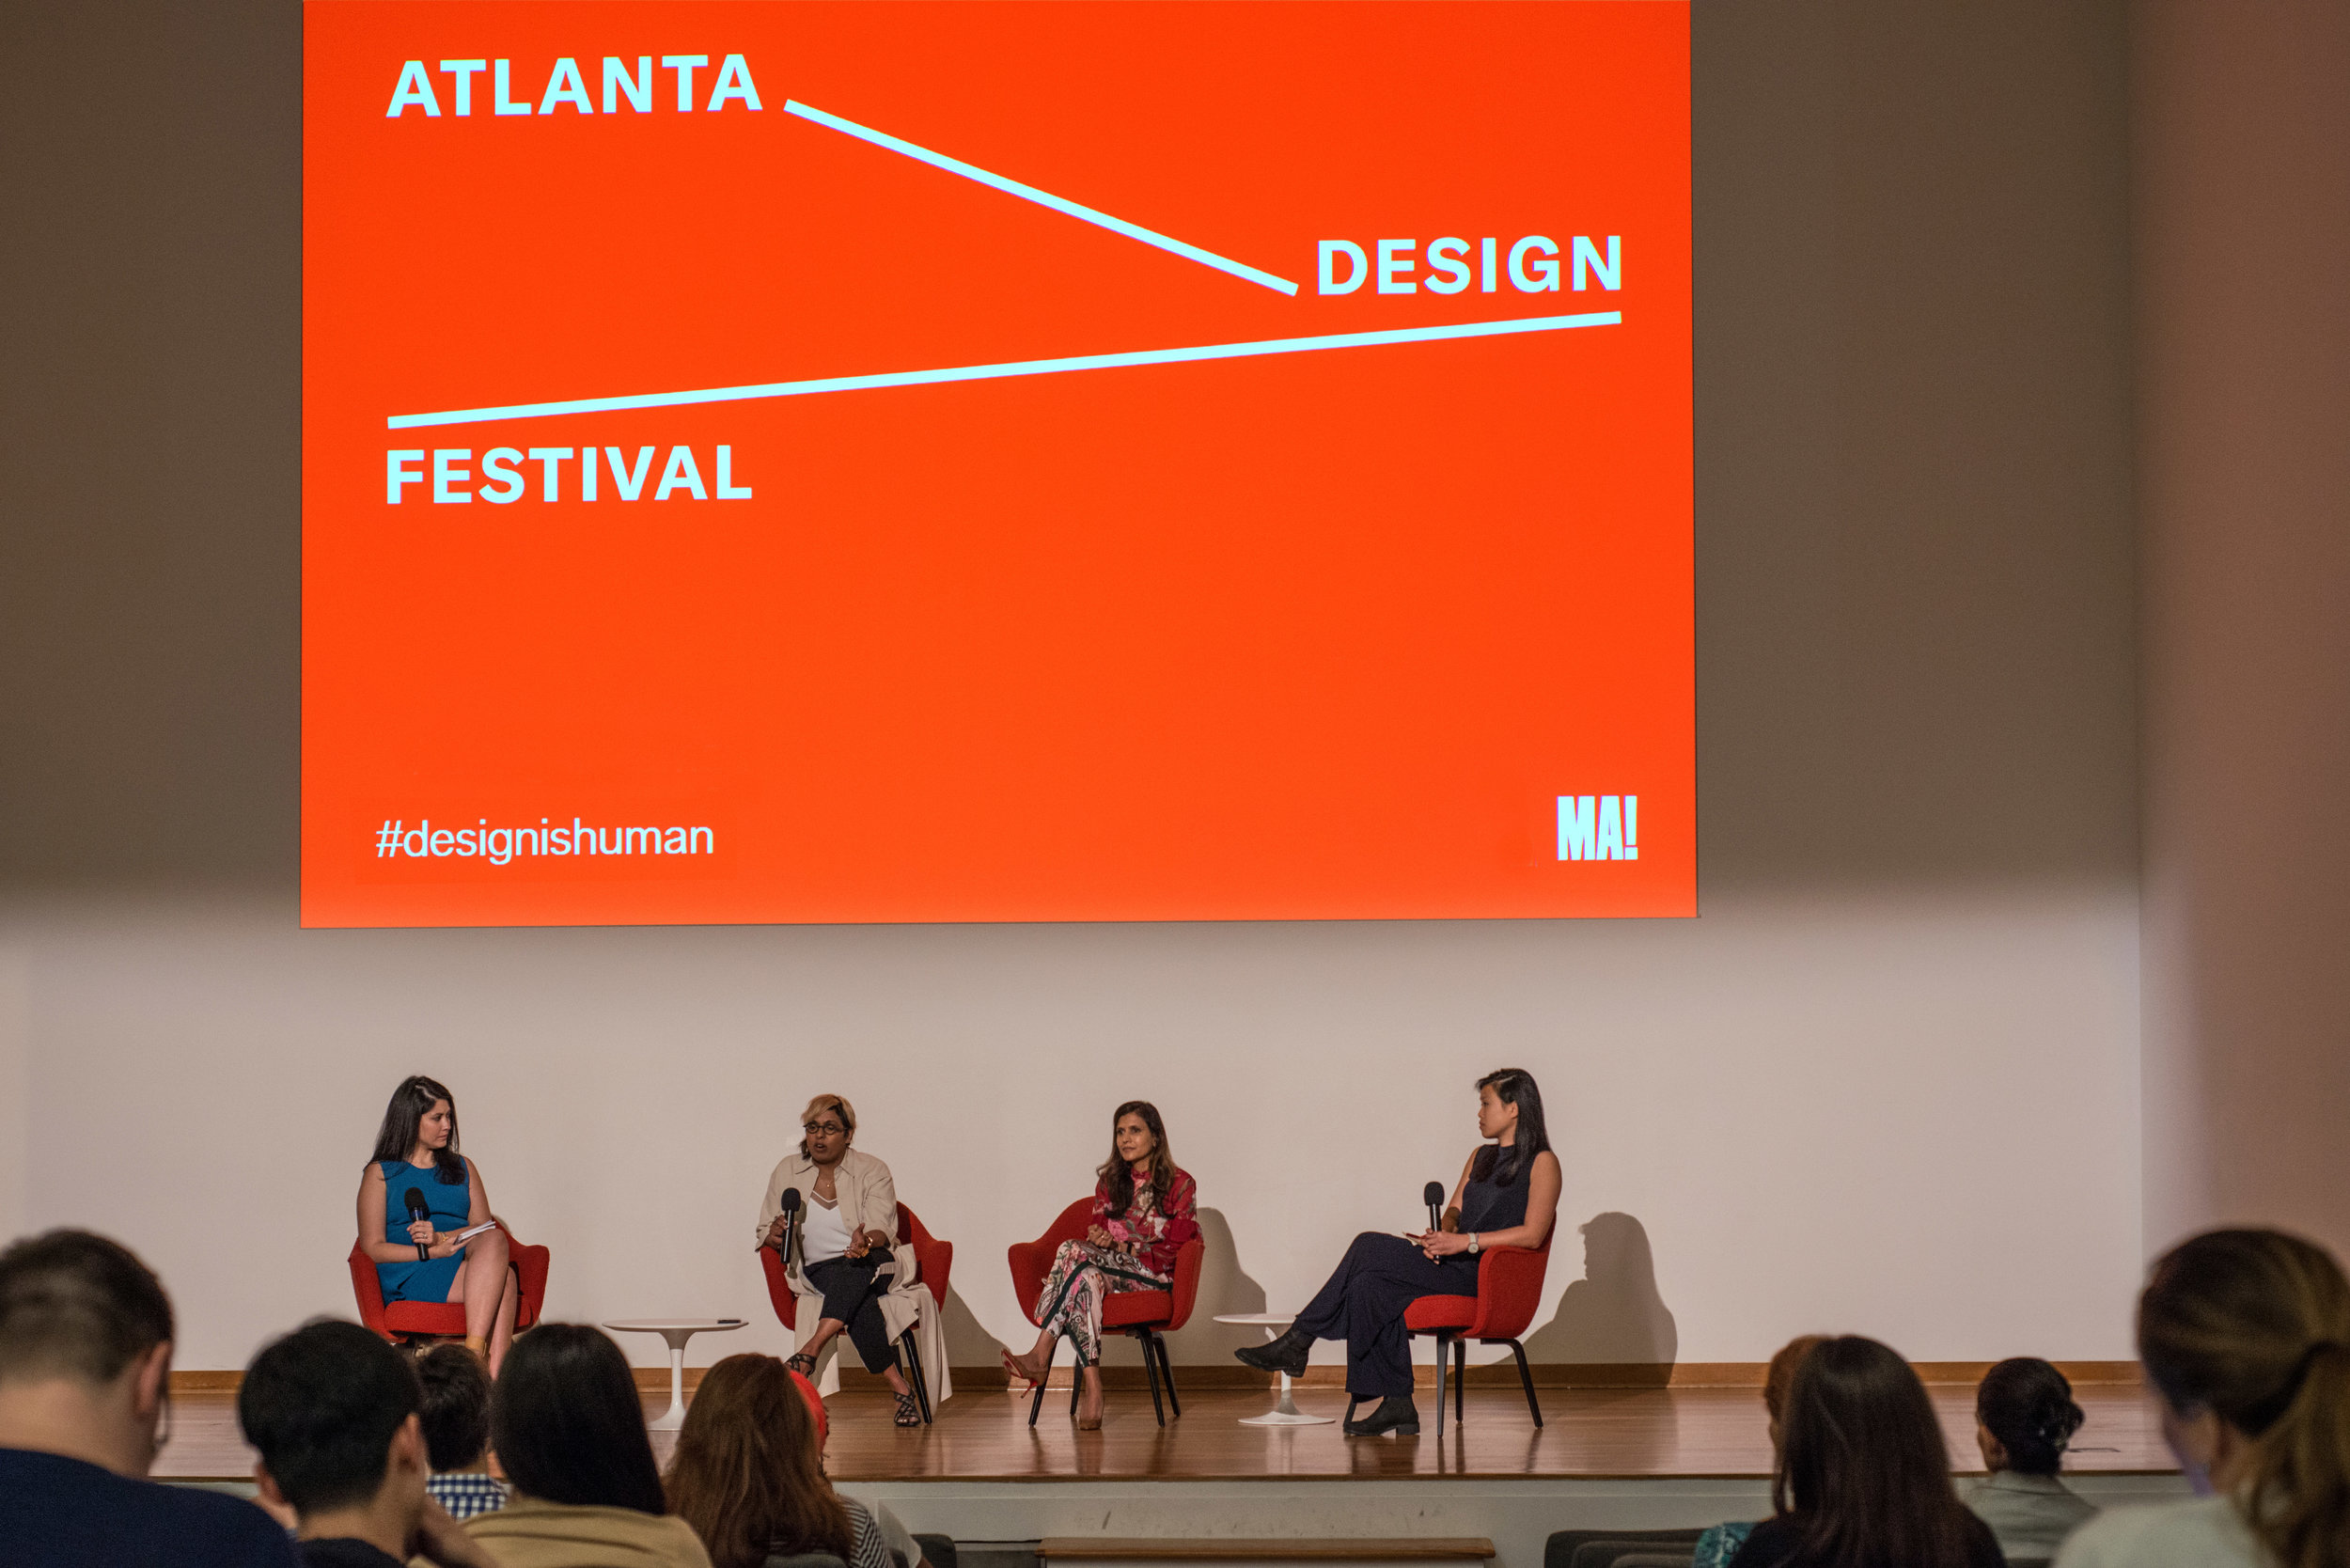 Studio-Verena-Hennig-Atlanta-Design-Festival-Branding-2.jpg